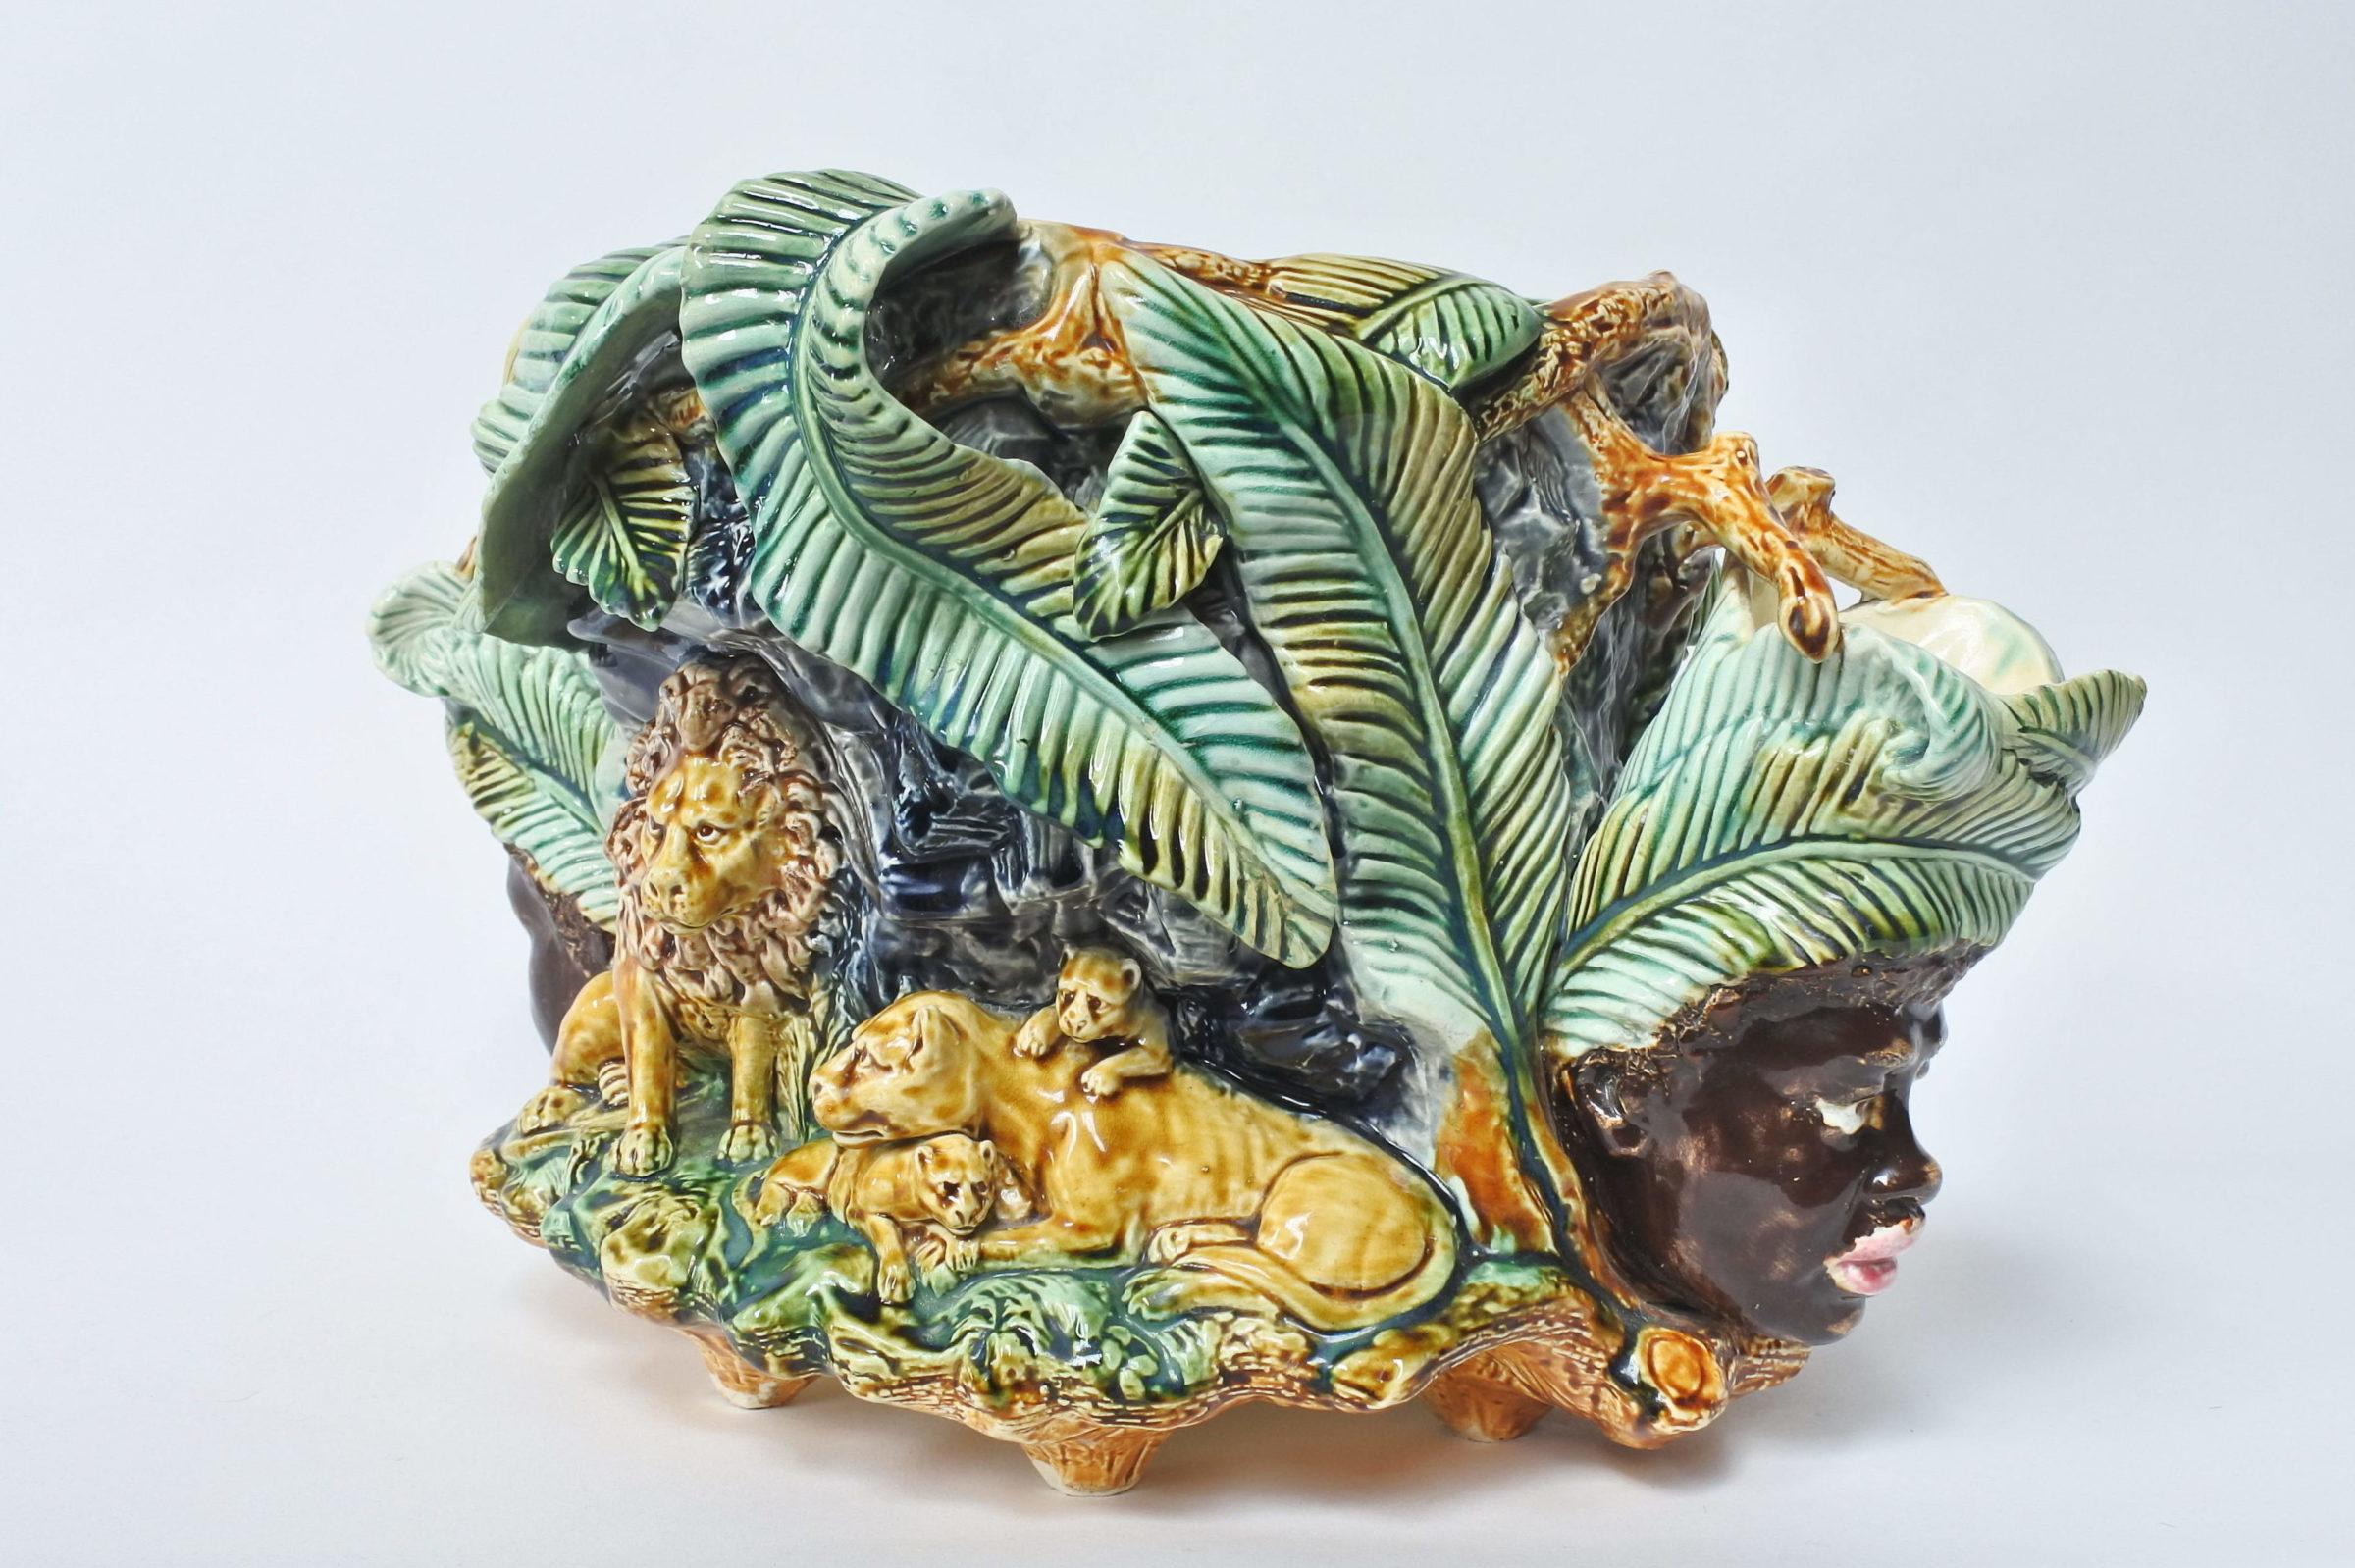 Centrotavola in ceramica barbotine con funzione di jardinière - Onnaing - 4